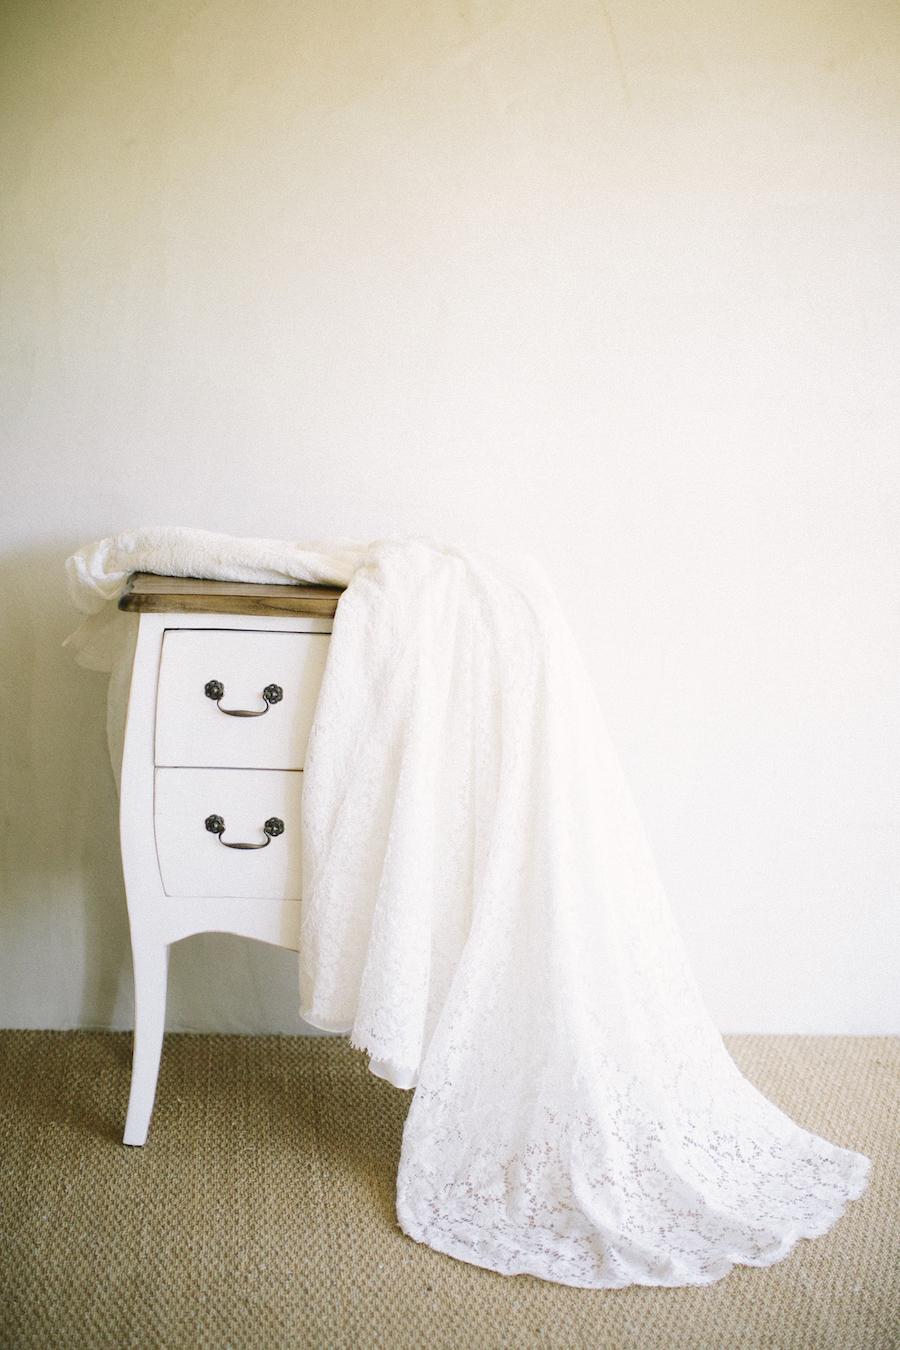 saya-photography-rustic-french-wedding-provence-domaines-de-patras-wedding-dress-.jpg